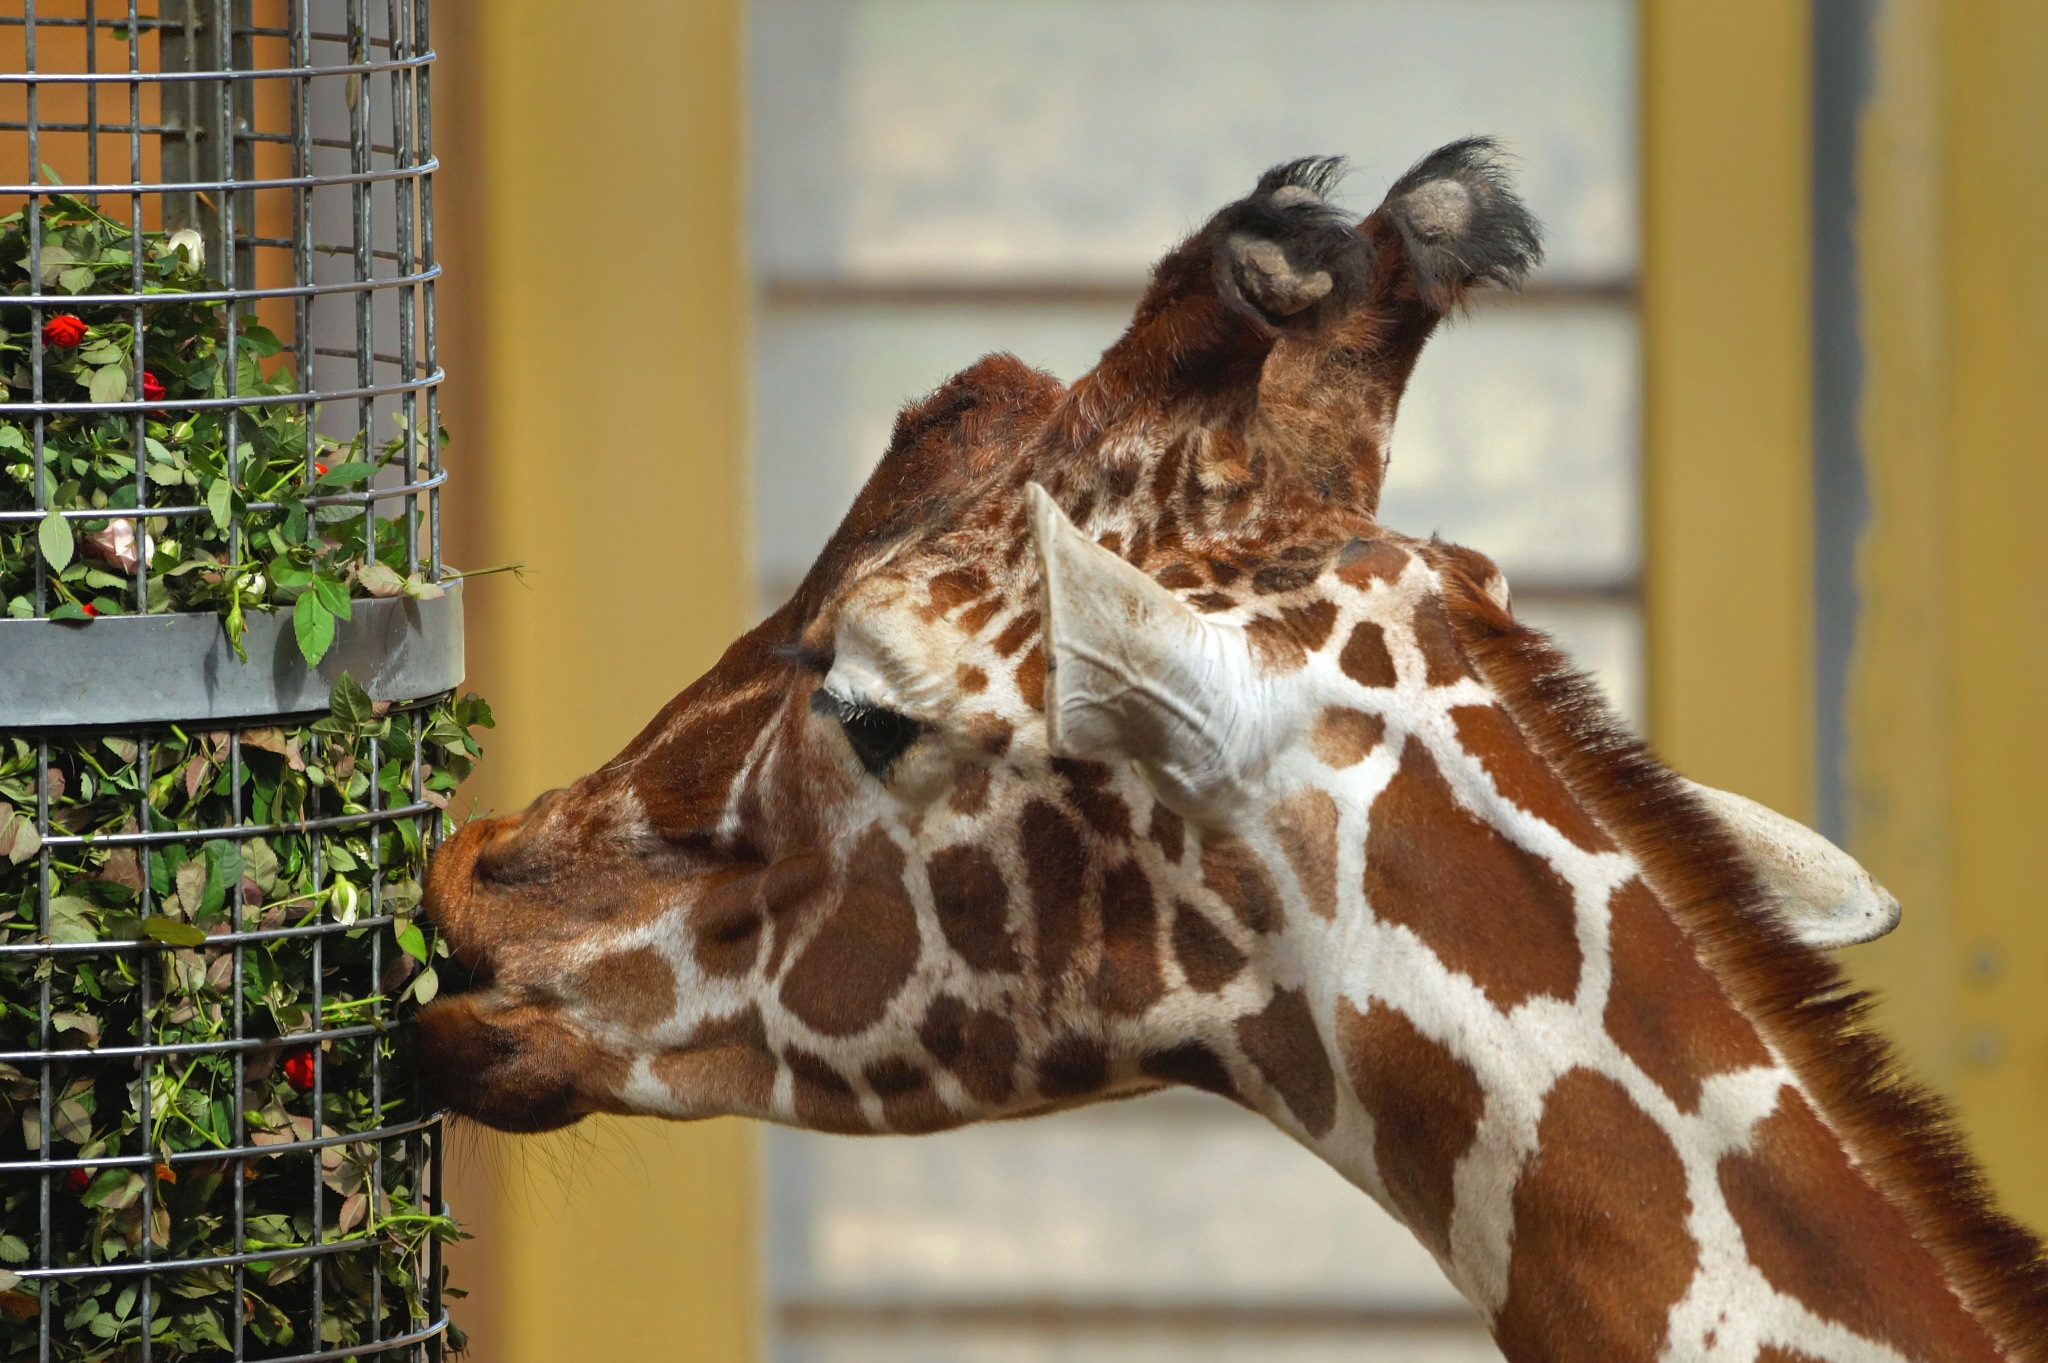 Giraffe by Marian Baay